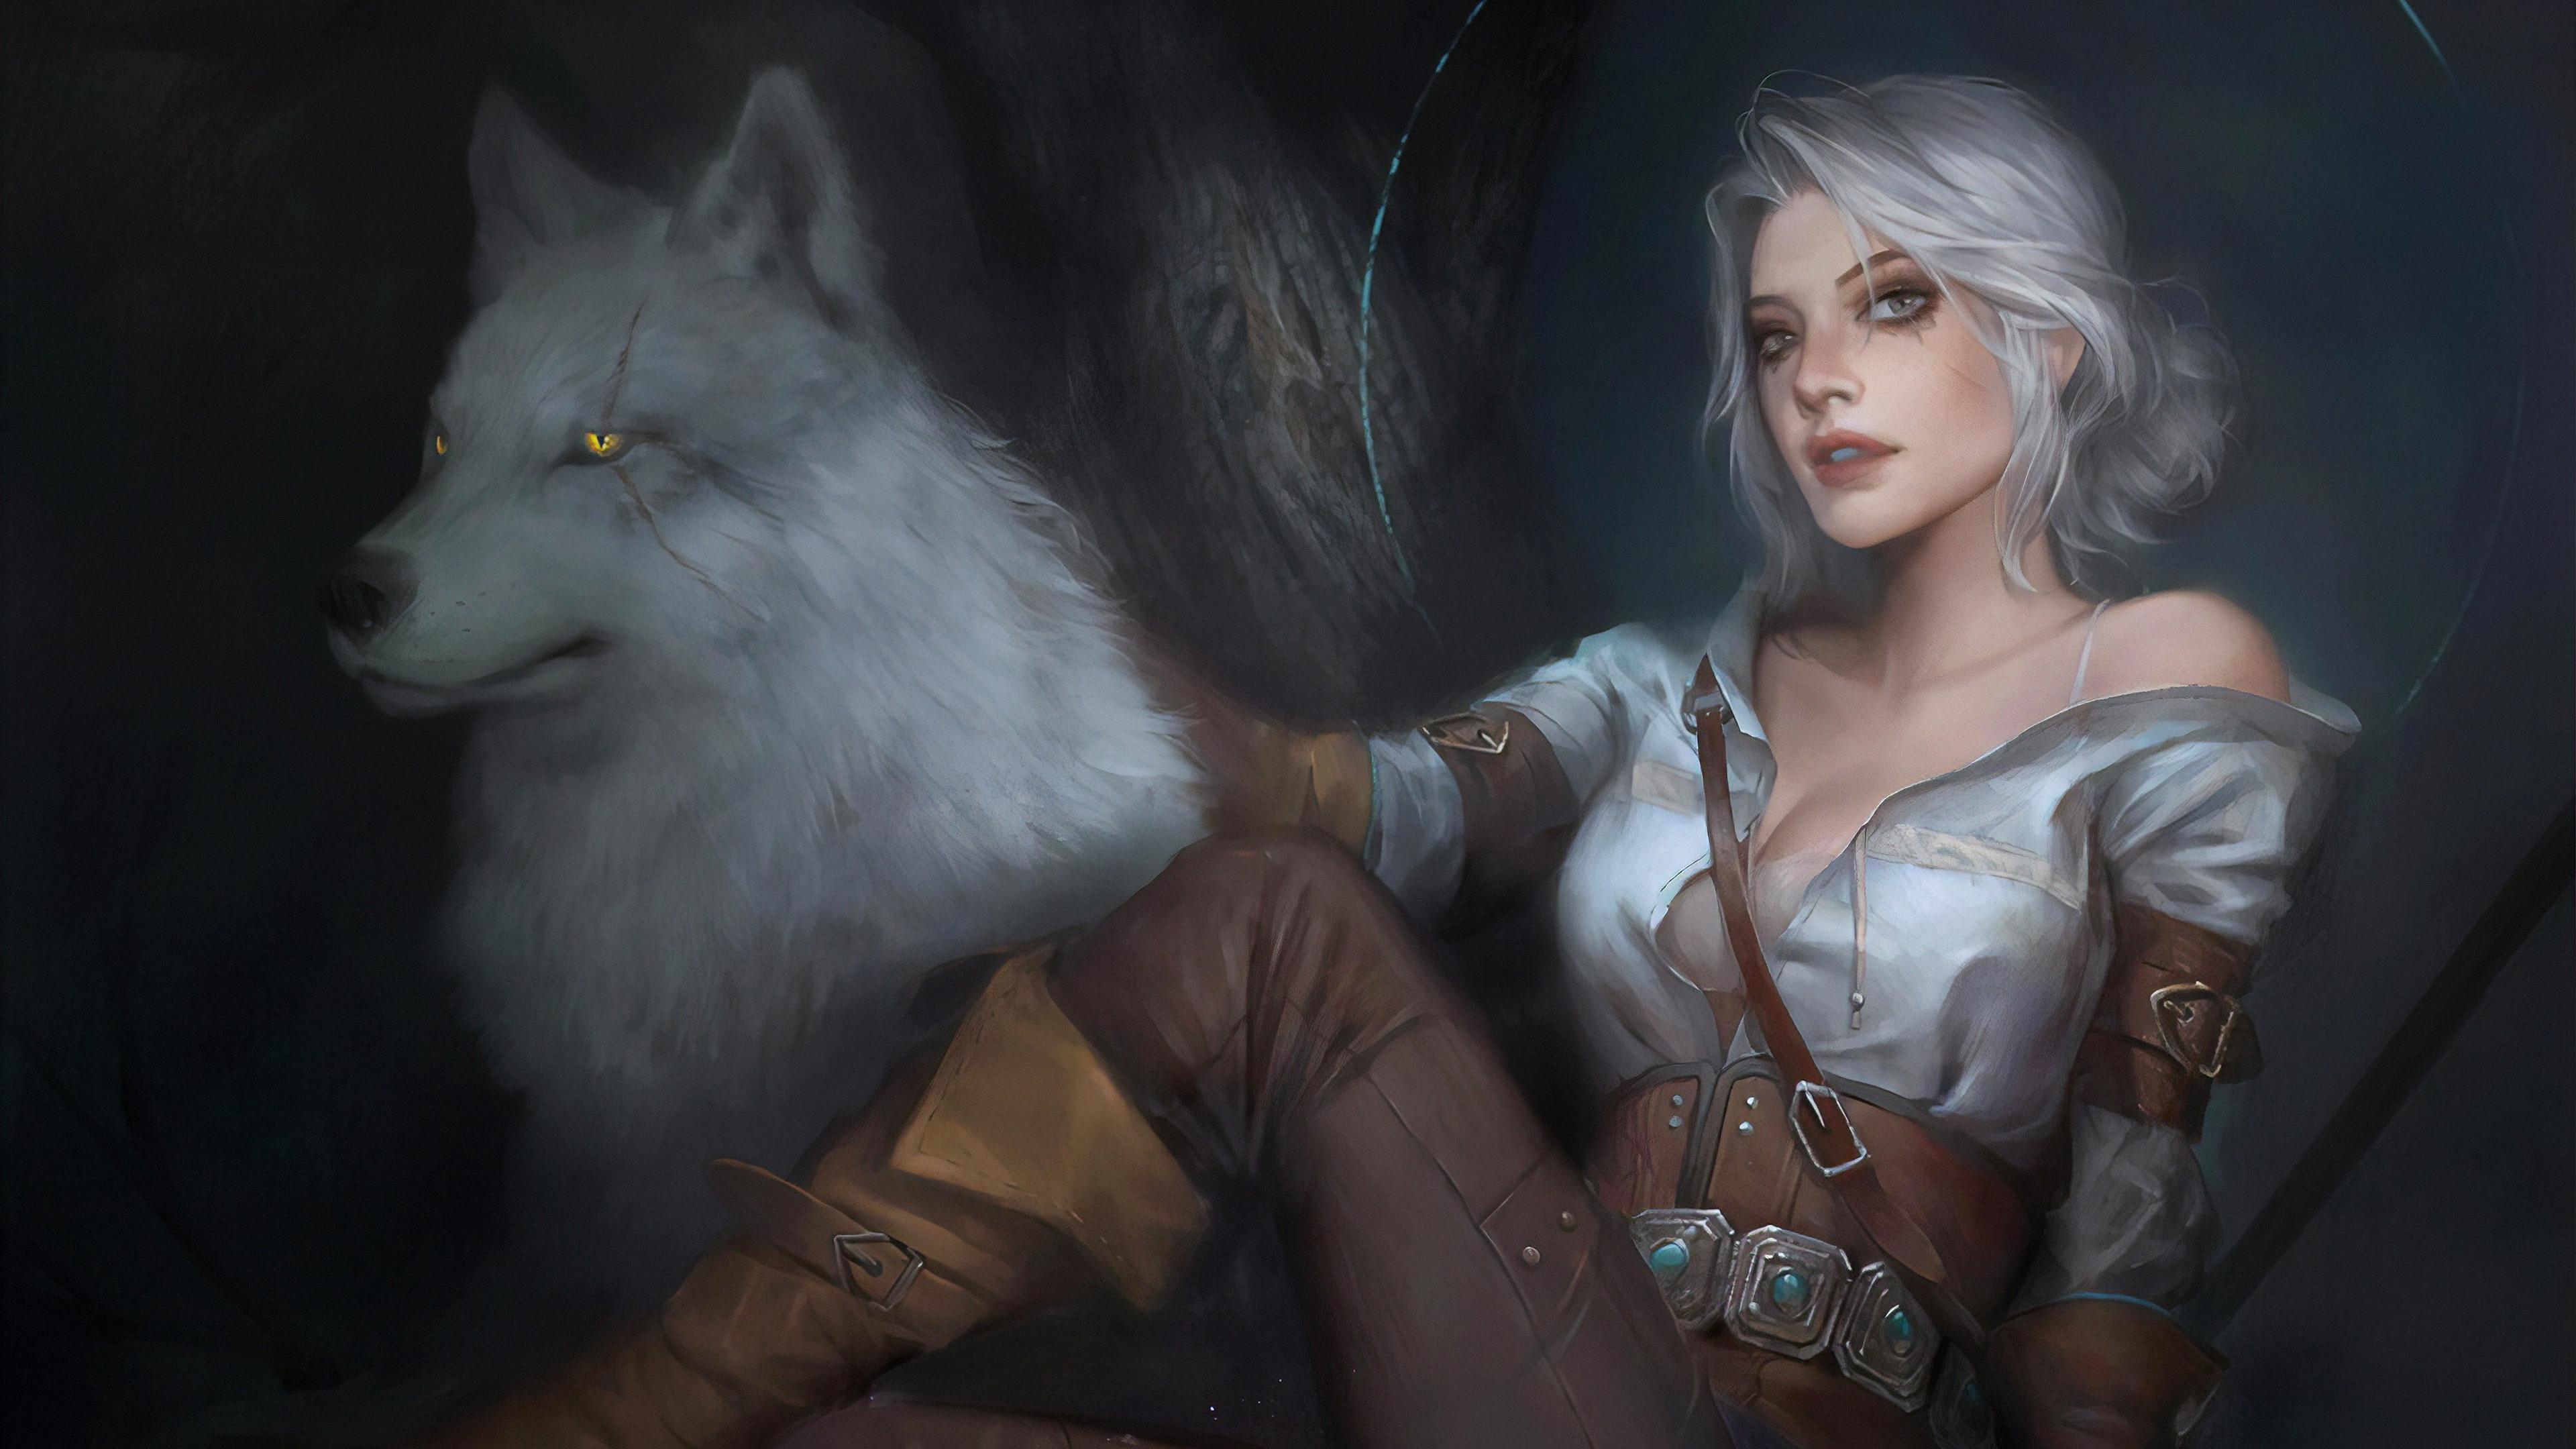 General 3840x2160 digital art artwork video games women Cirilla Fiona Elen Riannon The Witcher The Witcher 3: Wild Hunt looking at viewer white hair wolf